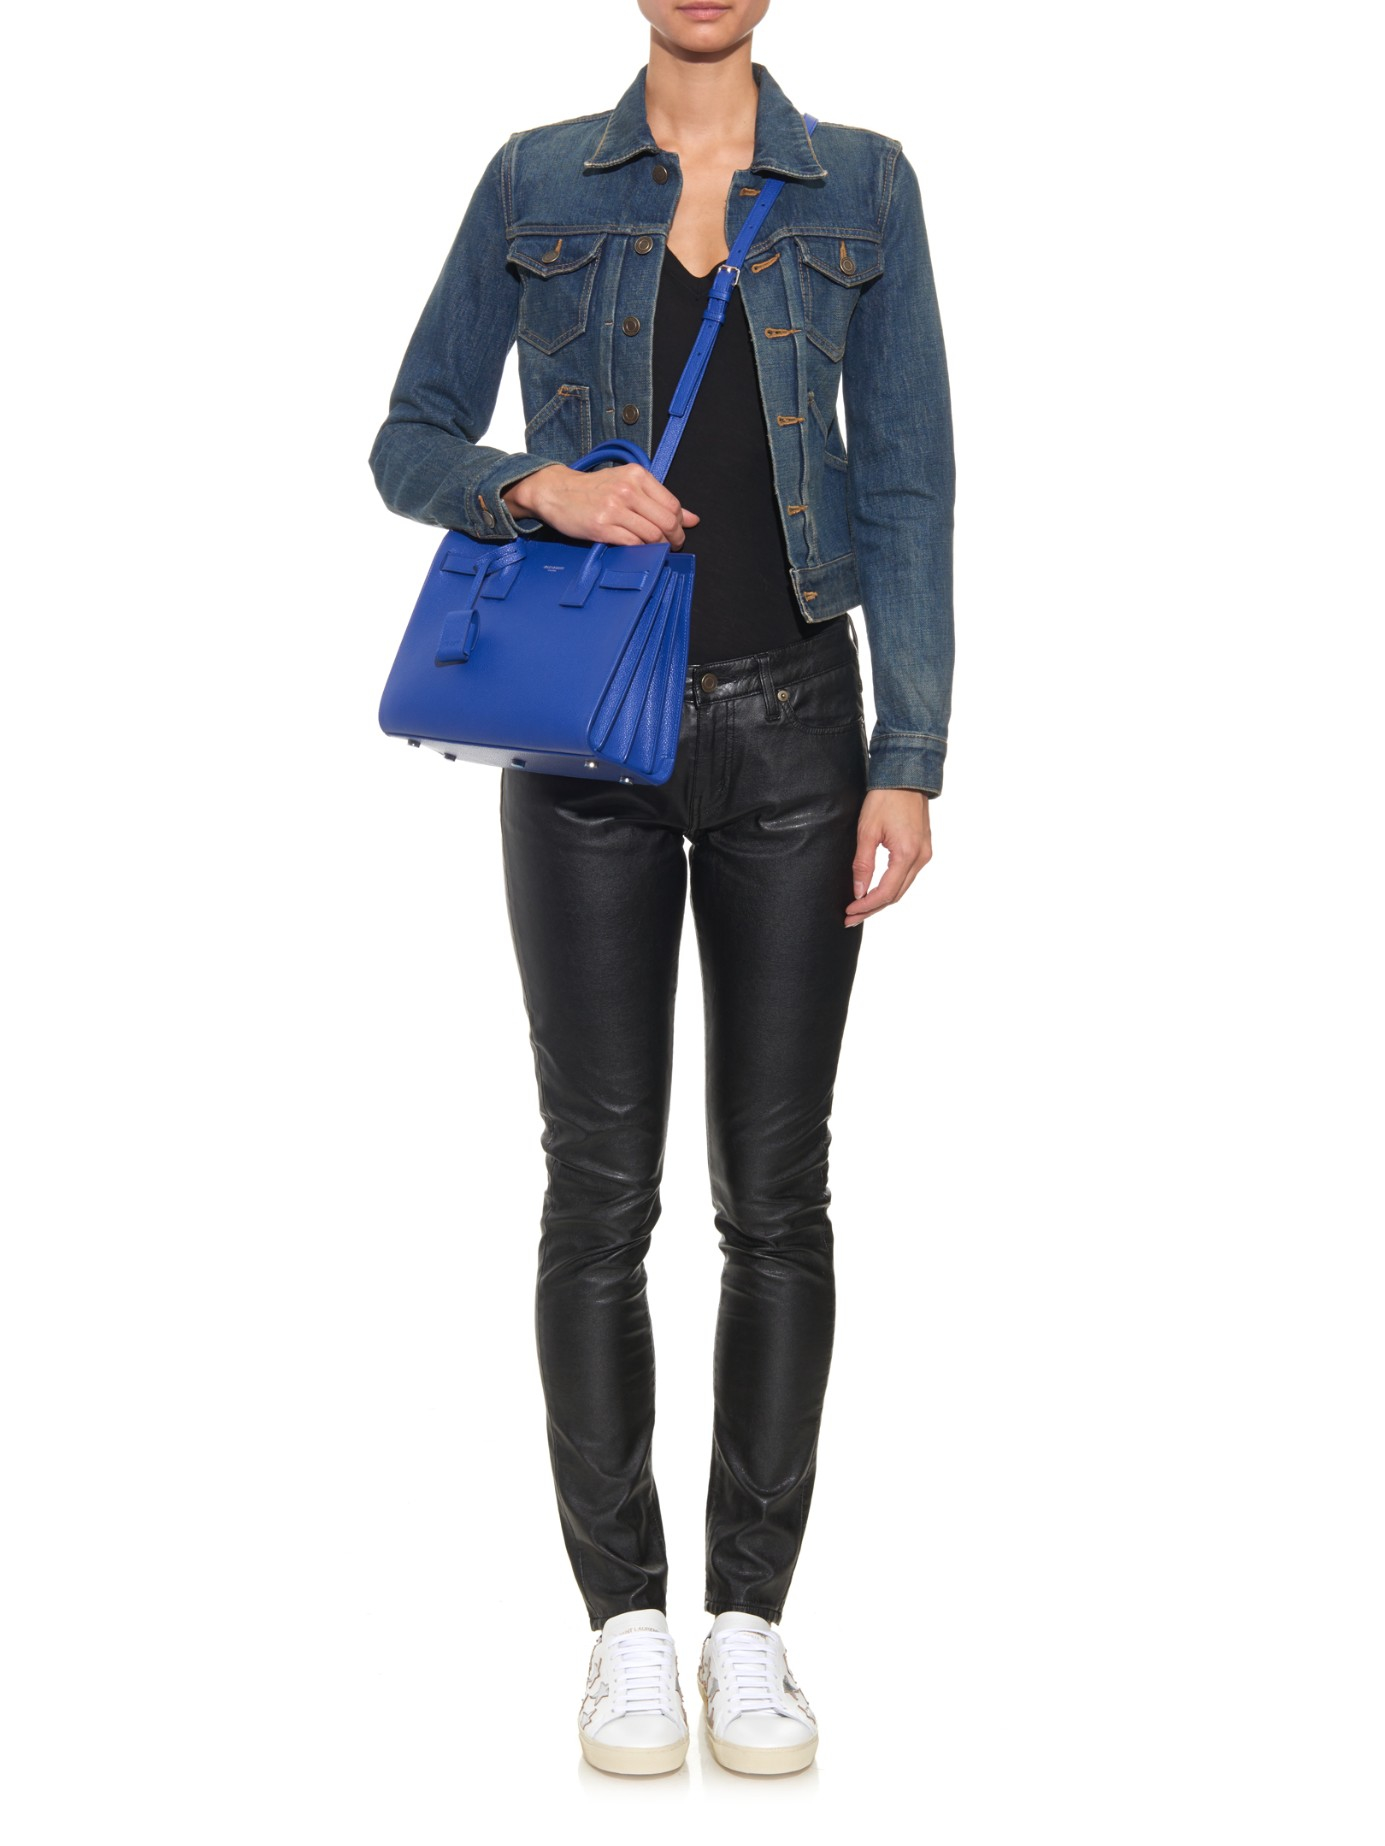 ysl cabas chyc crossbody - sac de jour mini grained leather satchel bag, cobalt